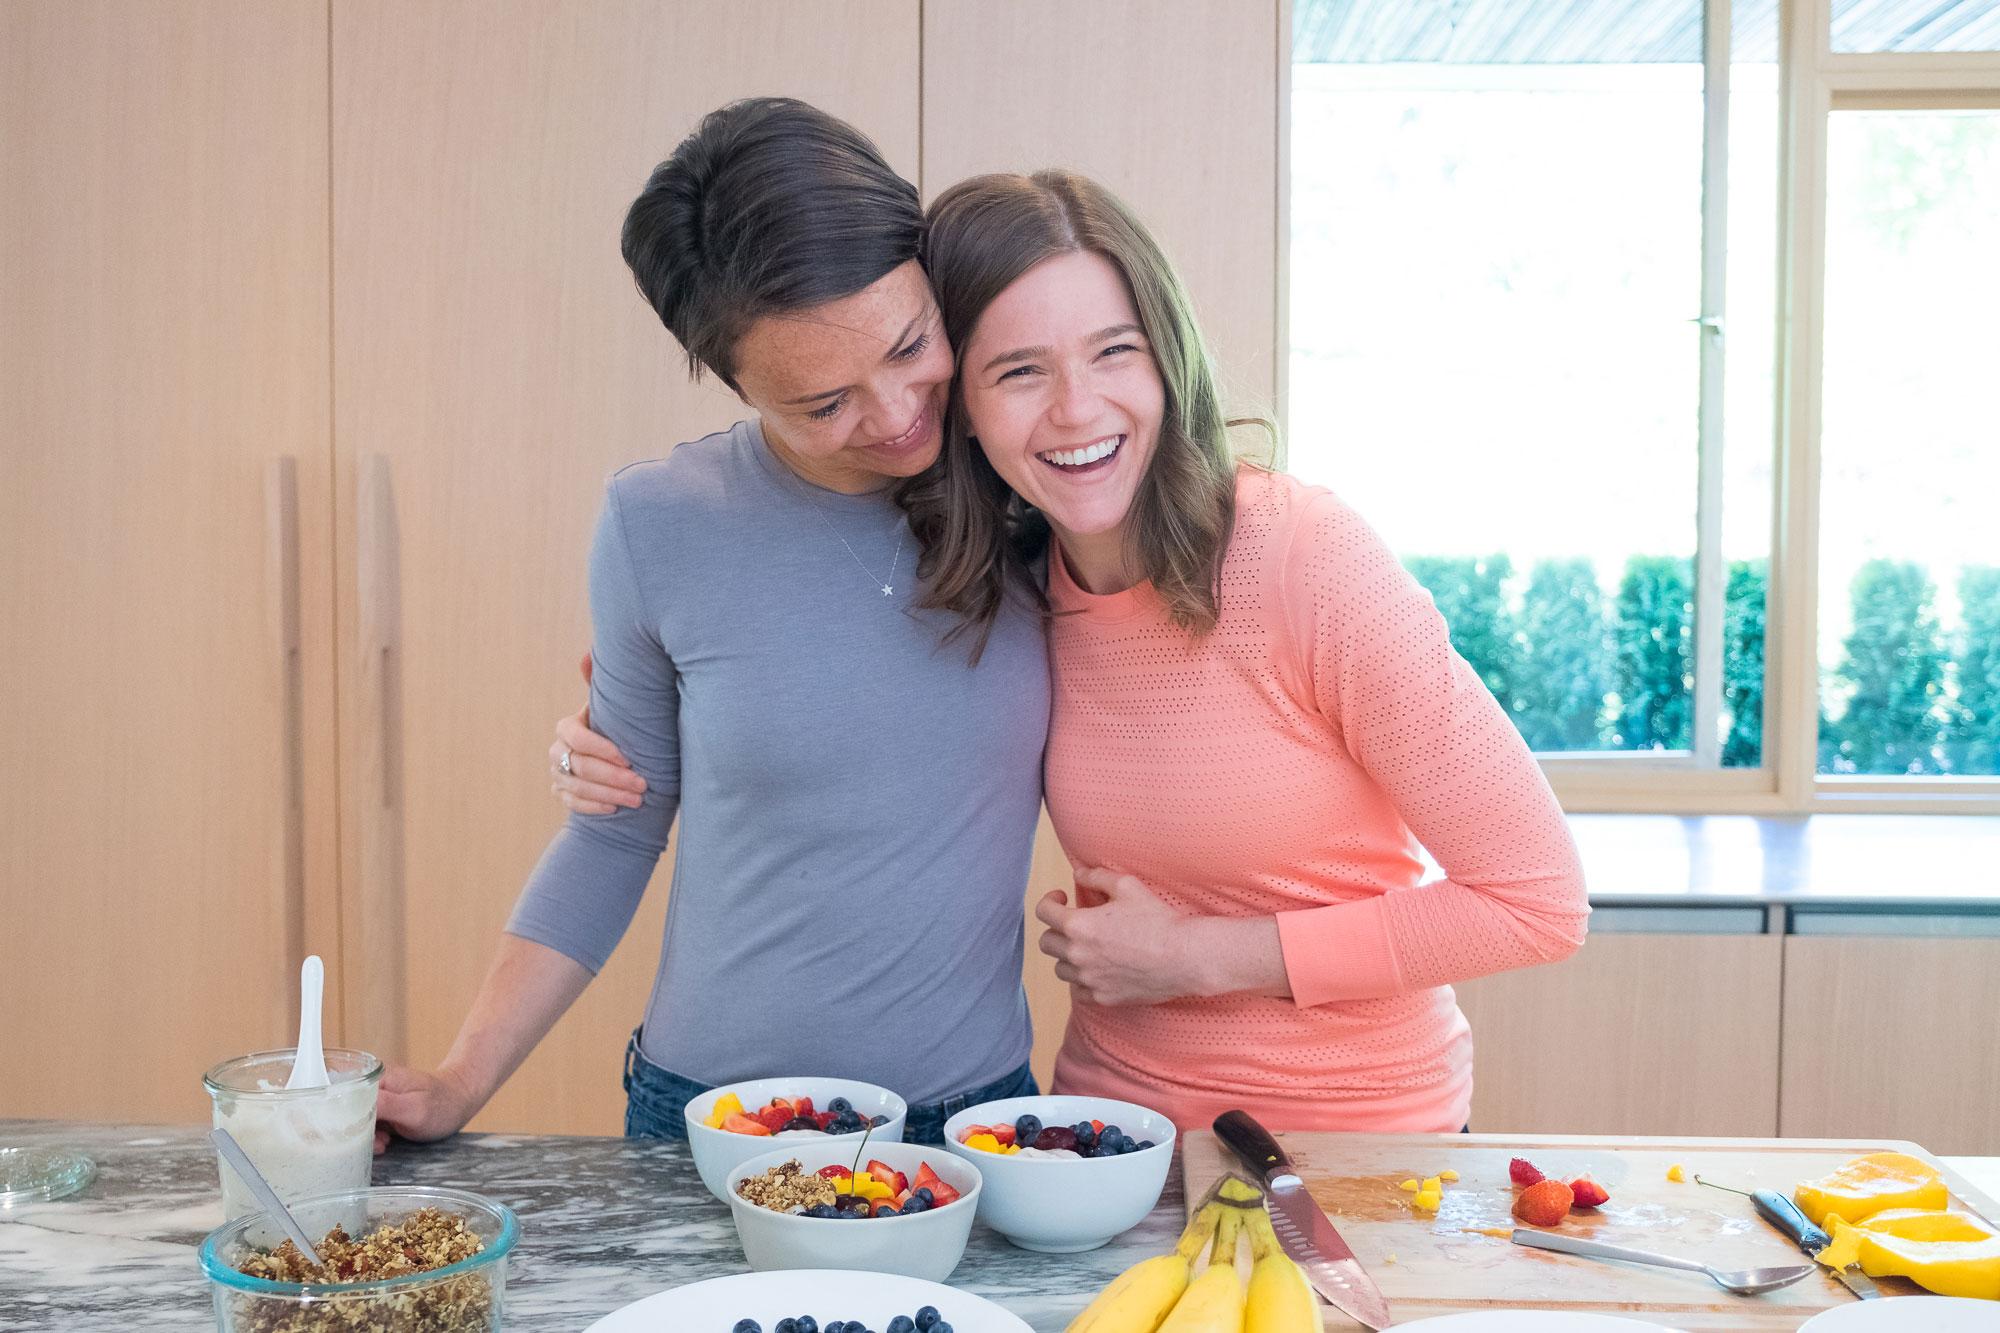 Nikki and Zuzana in kitchen making a plant-based buddha bowl